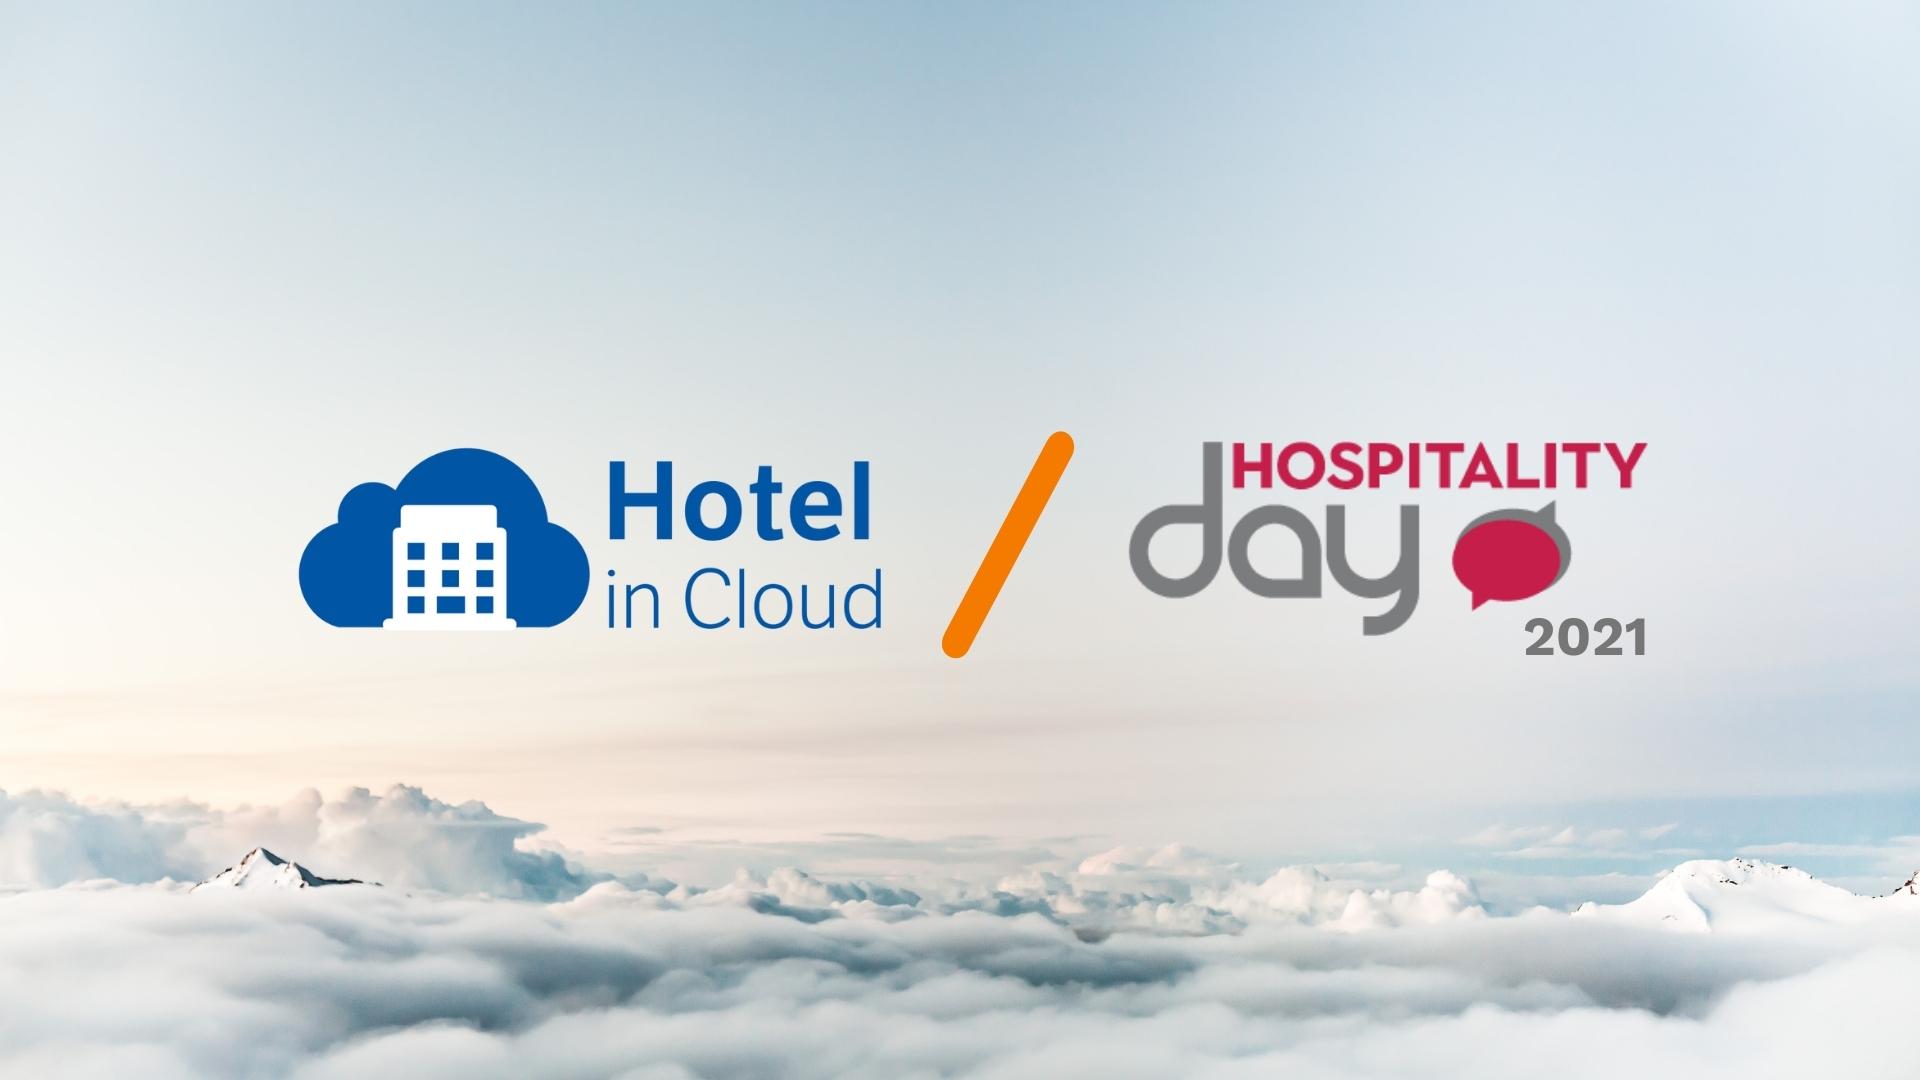 hospitalityday rimini 2021